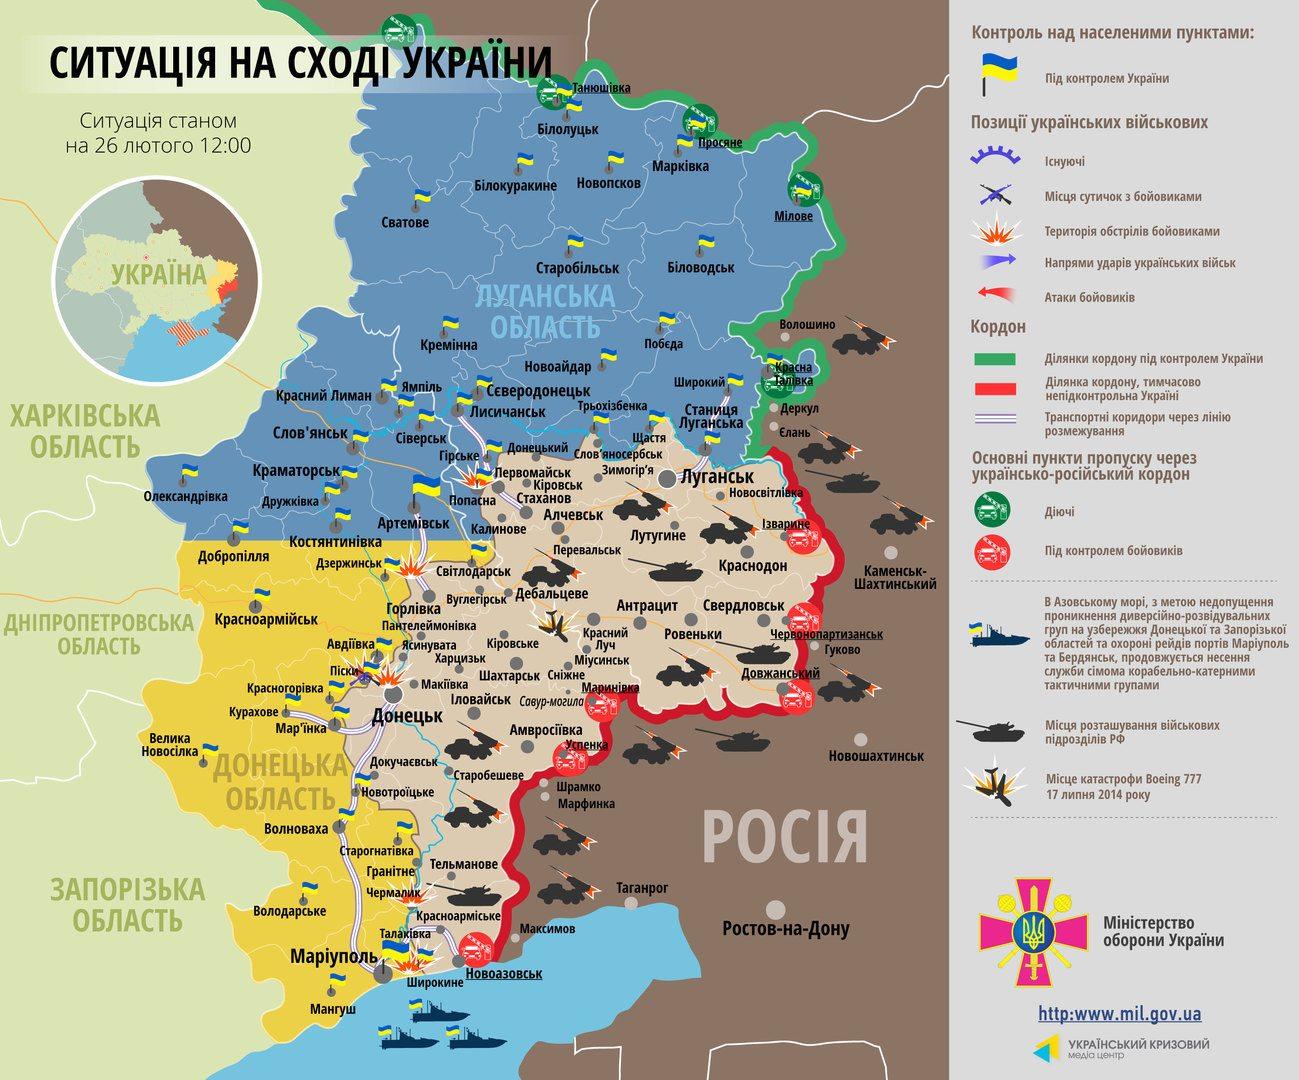 http://ck.ridna.ua/wp-content/uploads/2015/02/f3d2473bc322ffcdf580c28ad0295aba.jpg